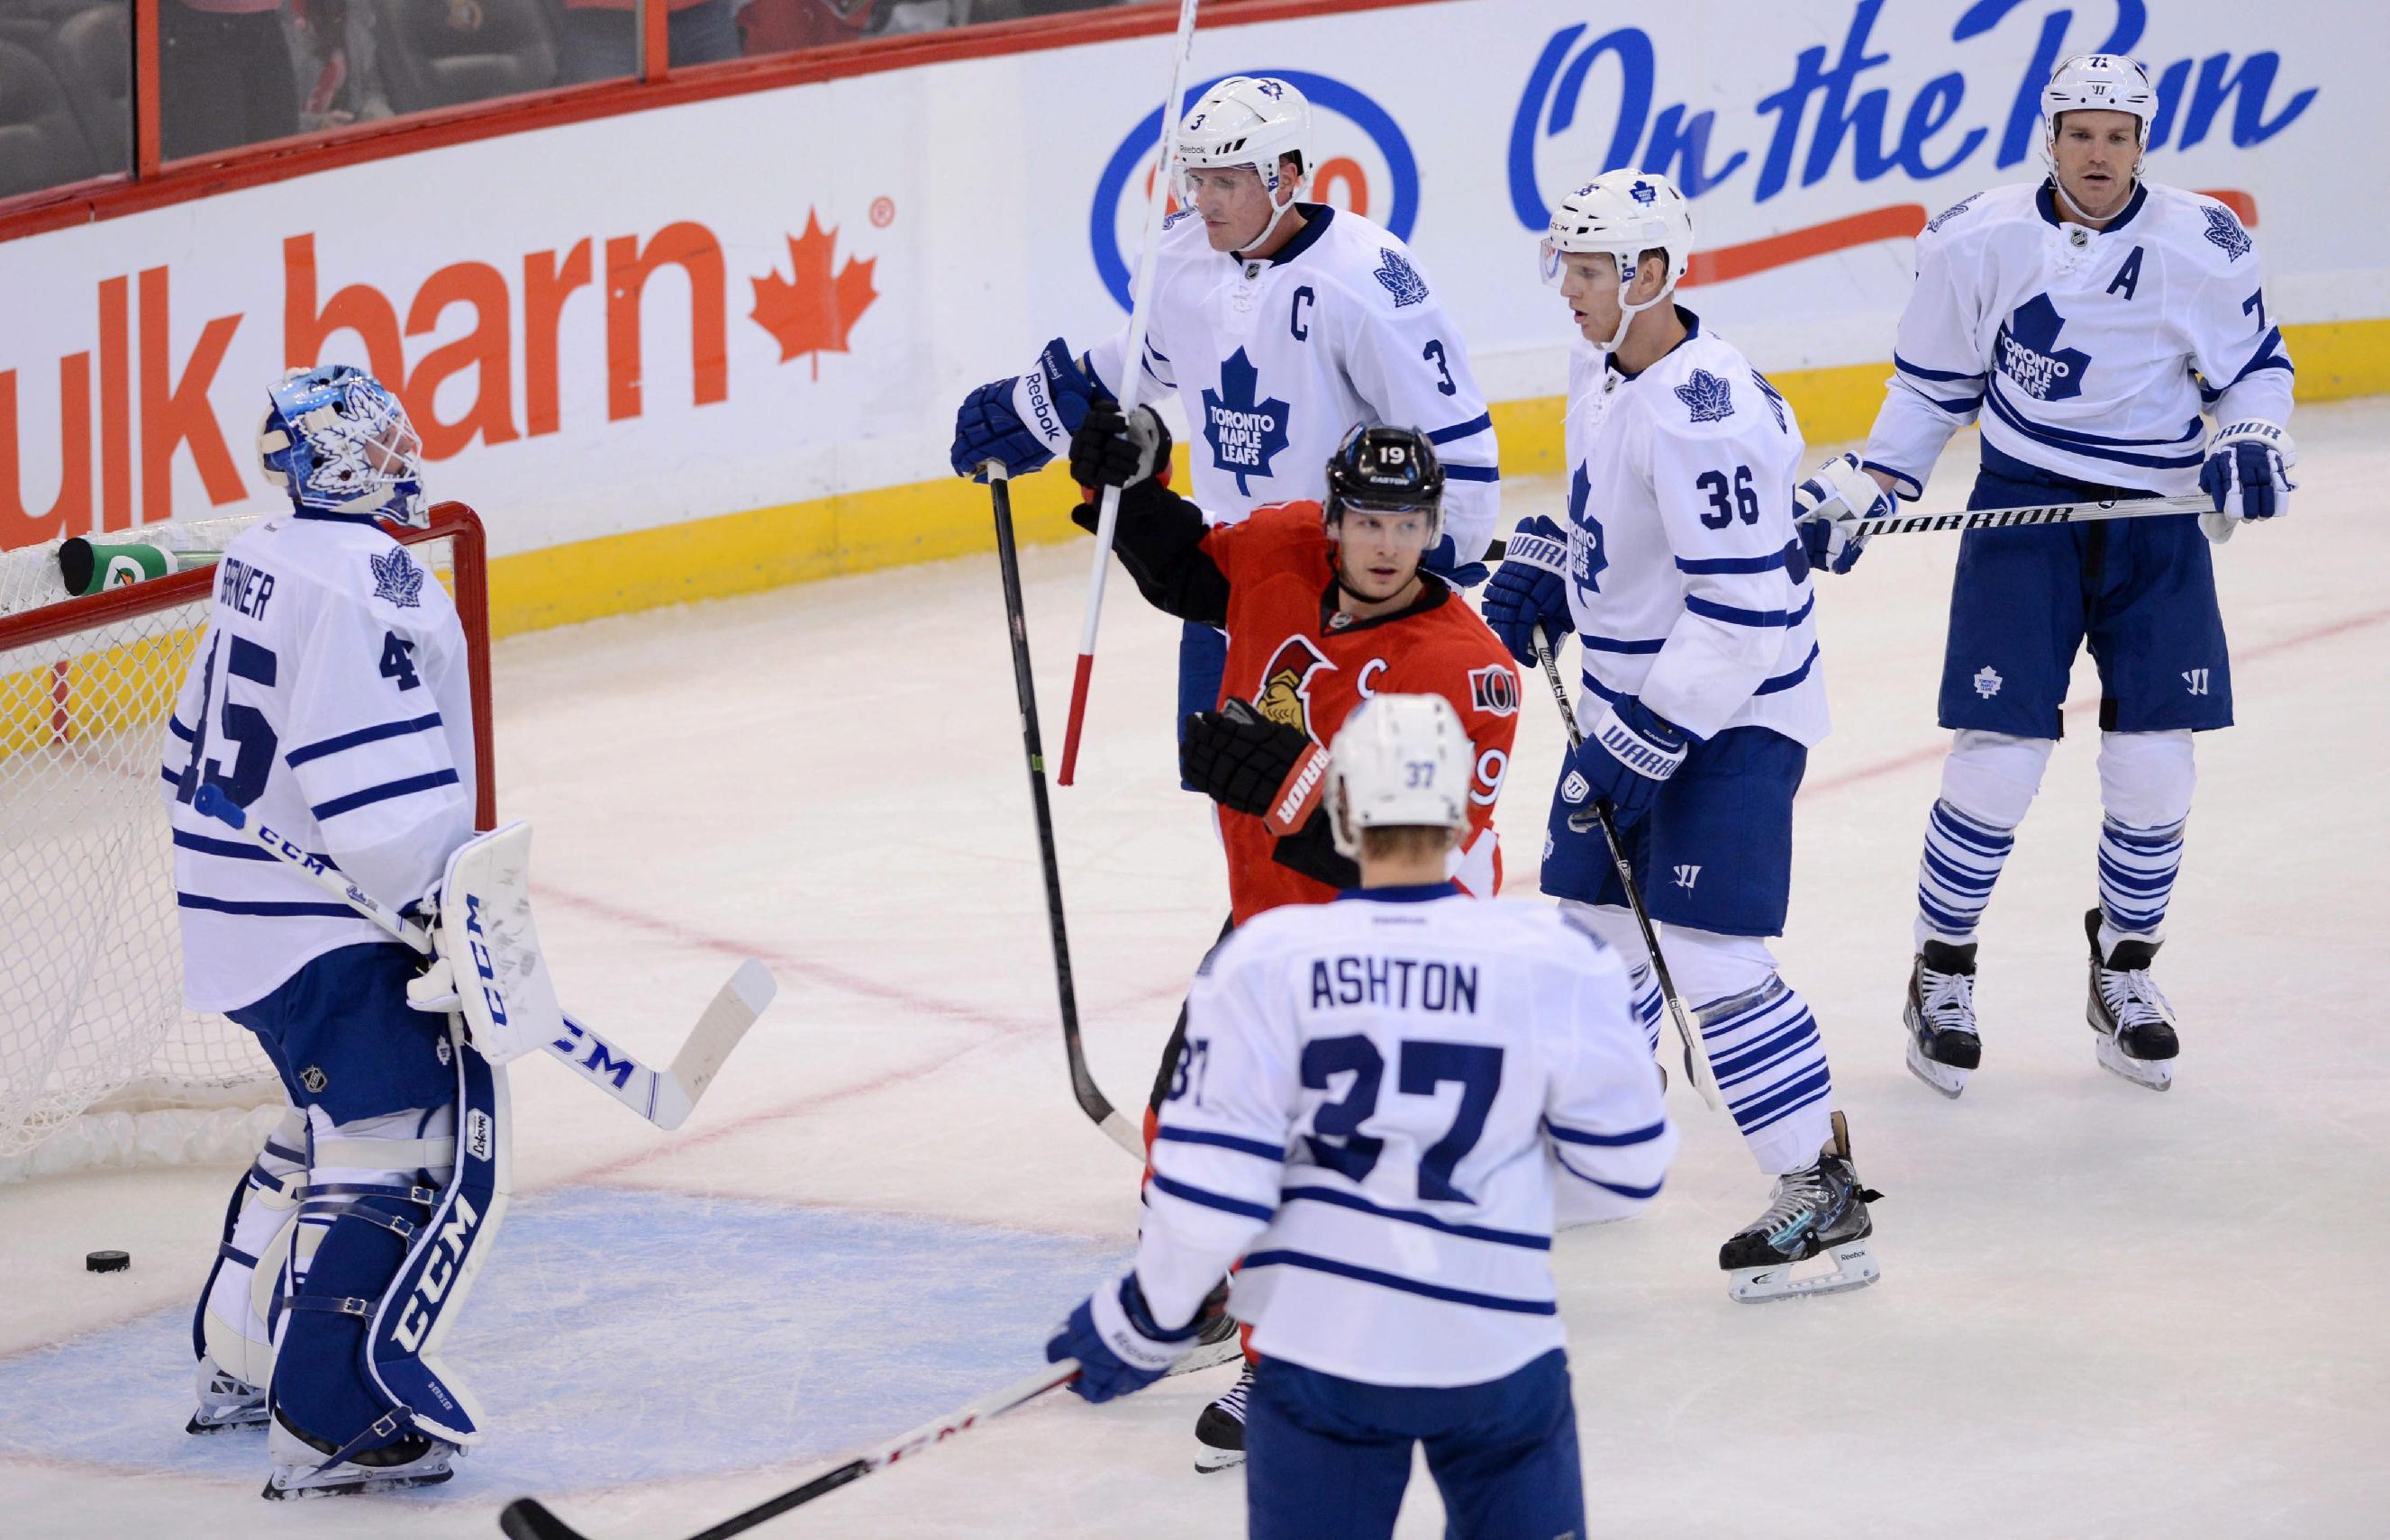 Ottawa Senators' captain Jason Spezza, center, celebrates a goal by teammate Fredrik Claesson against the Toronto Maple Leafs' goaltender Jonathan Bernier, left, during a preseason NHL hockey game in Ottawa, Ontario on Thursday, Sept. 19, 2013